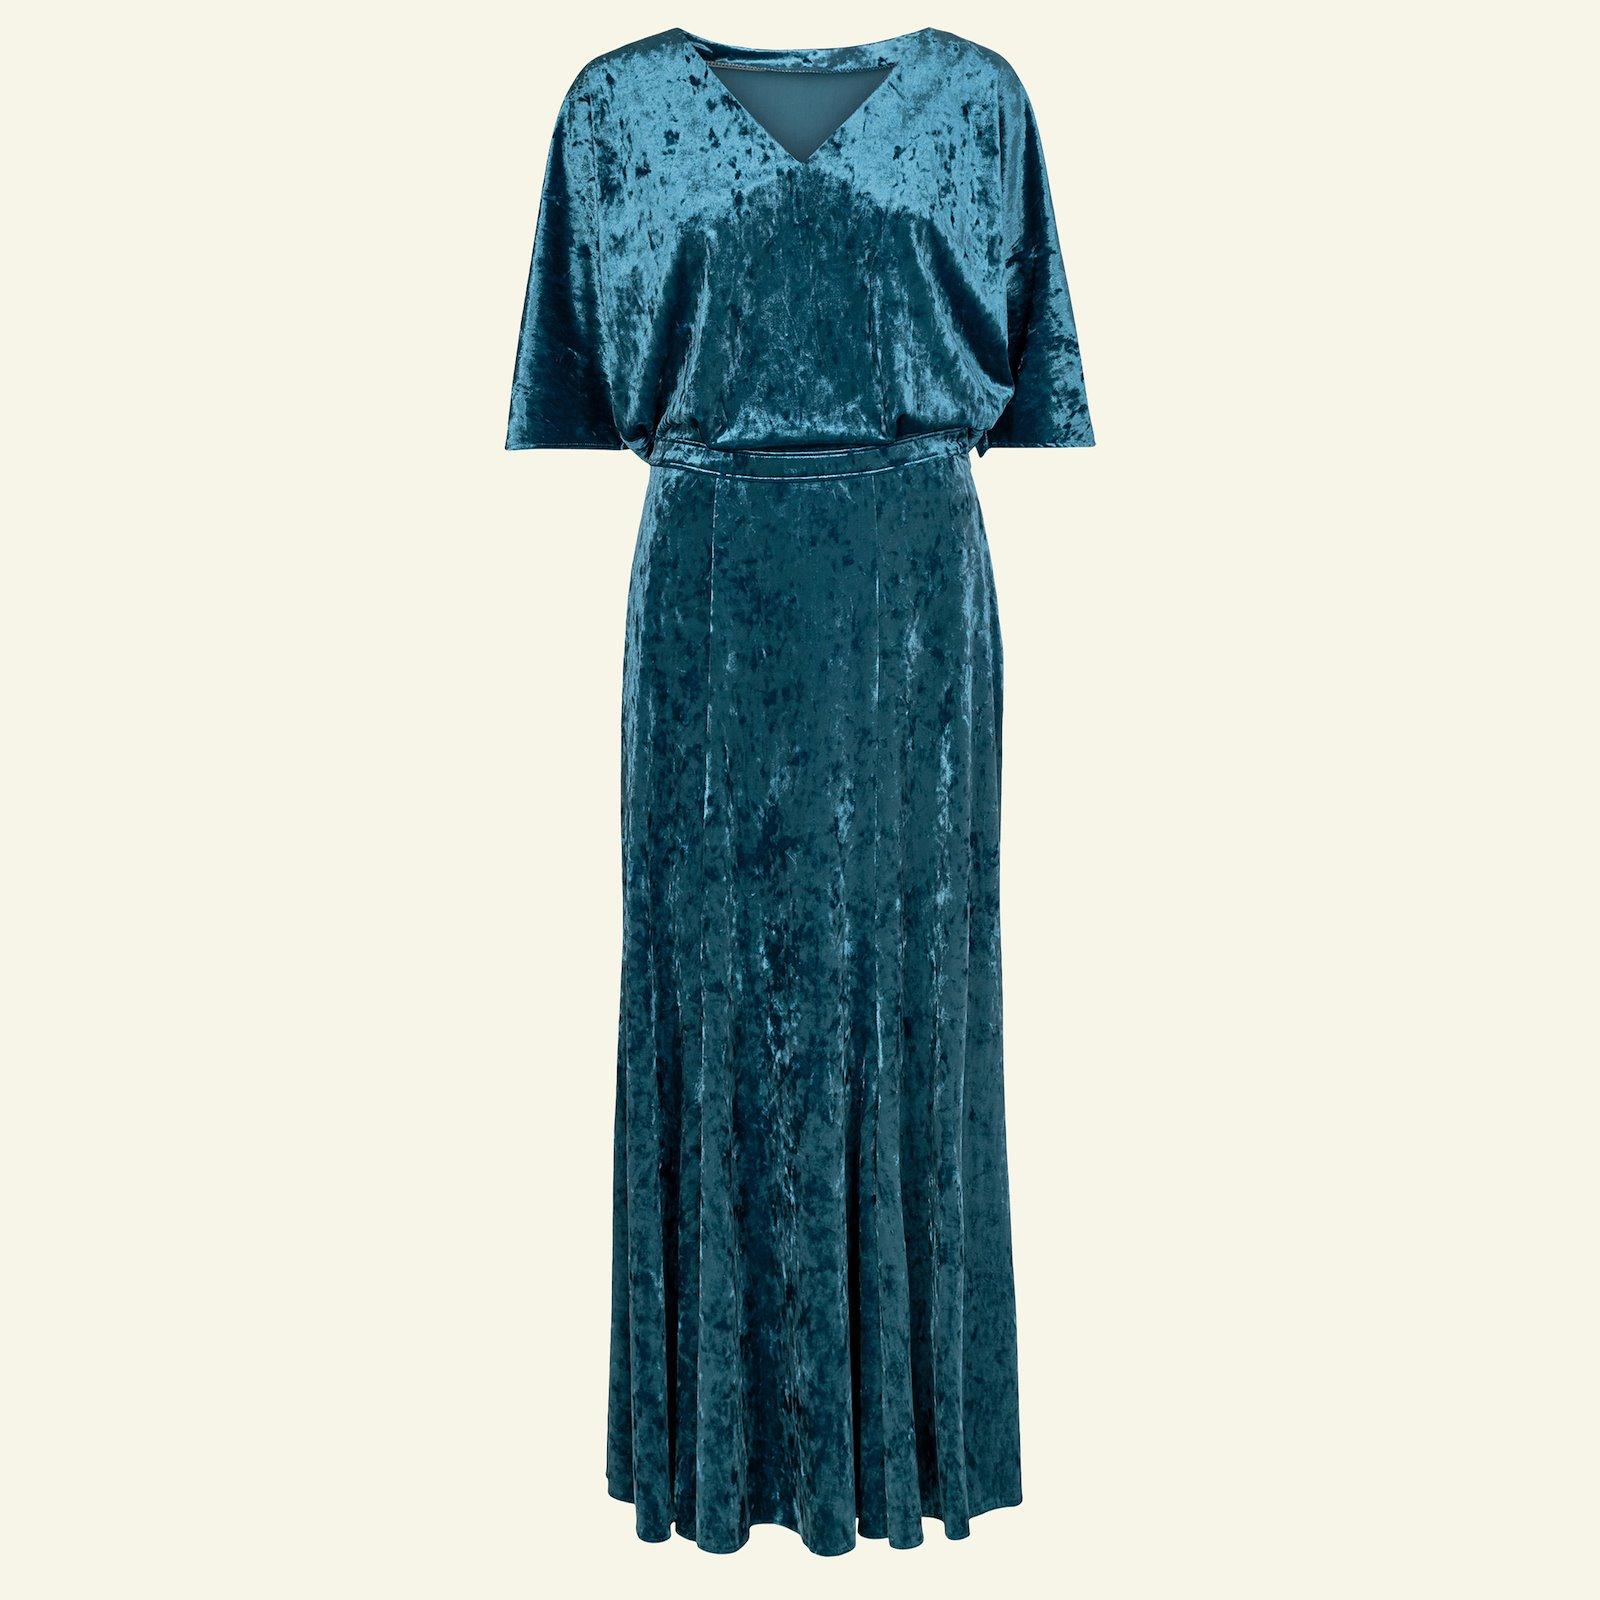 Wide dress with V-neck, 44/16 p23153_250744_sskit